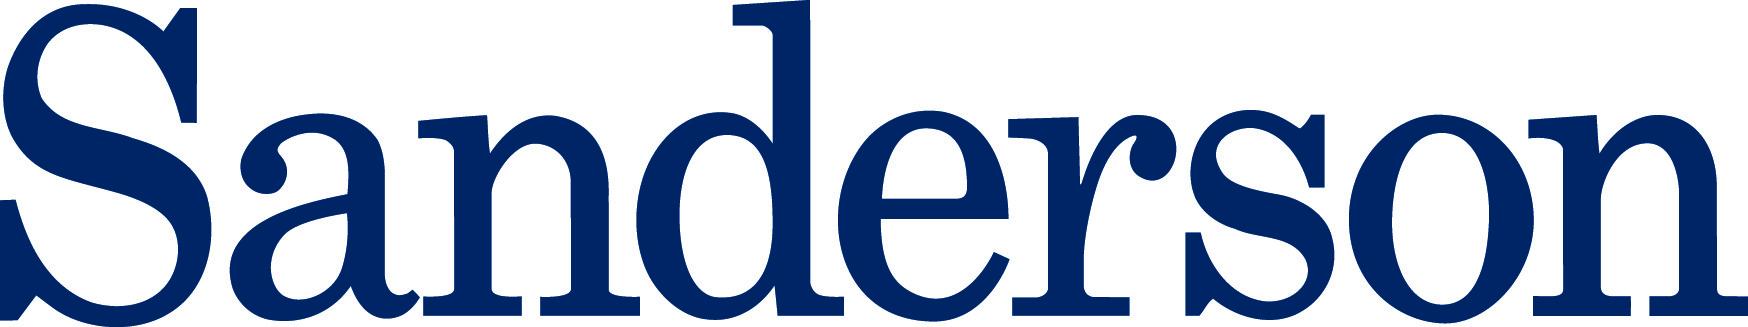 Sanderson-Logo-word-blue